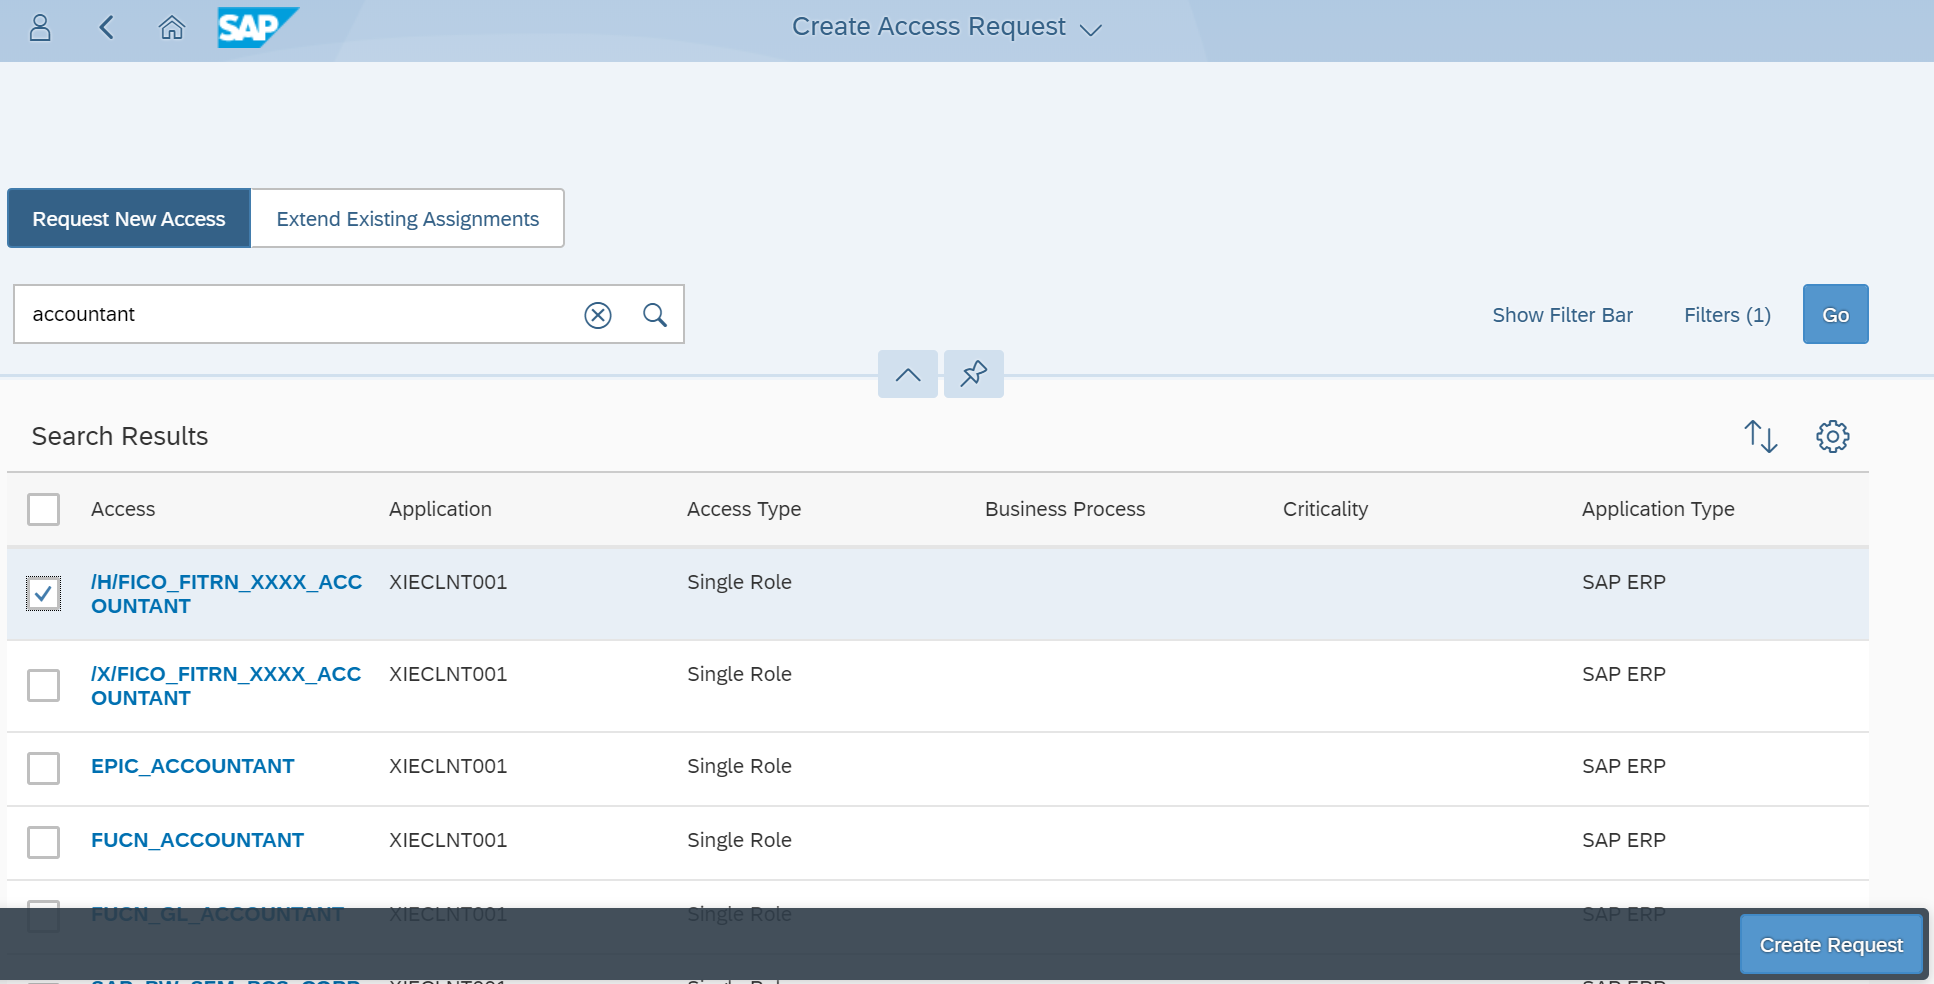 SAP Cloud IAG - Create Access Request